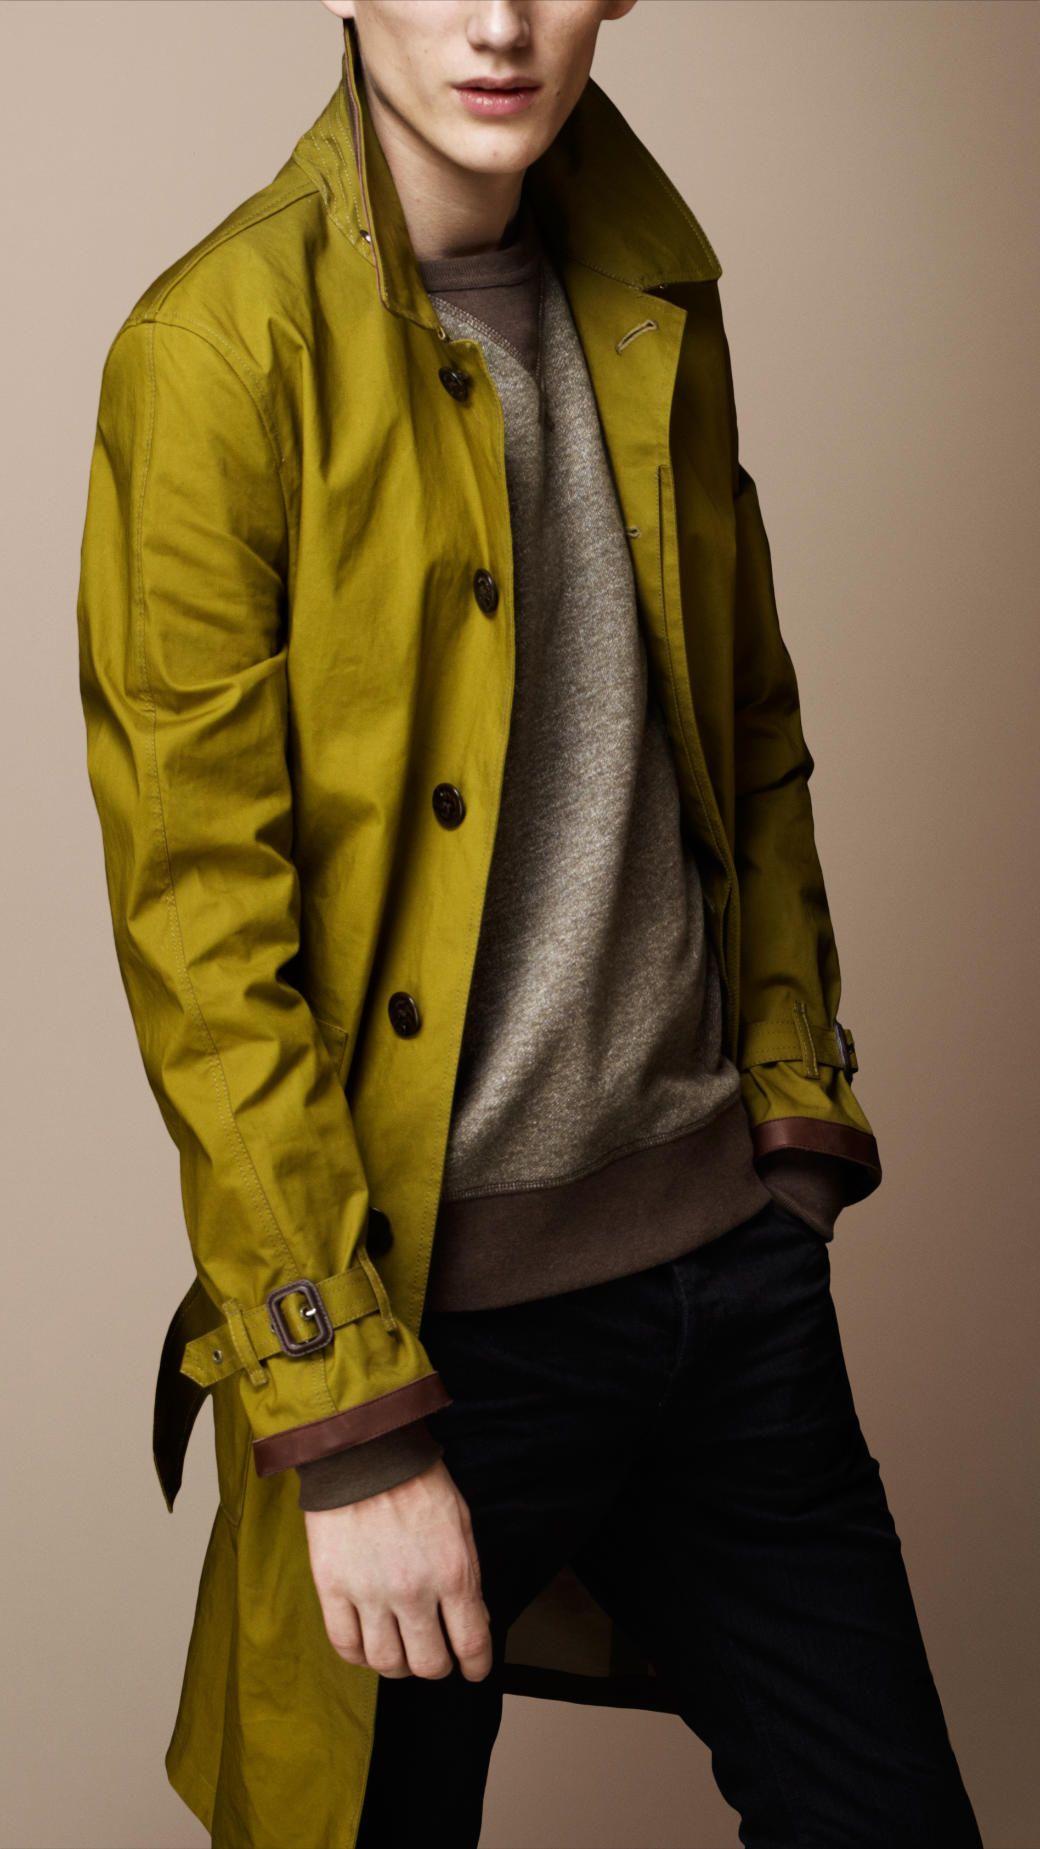 Men's Coats Pea, Duffle & Top Coats Trench coat men